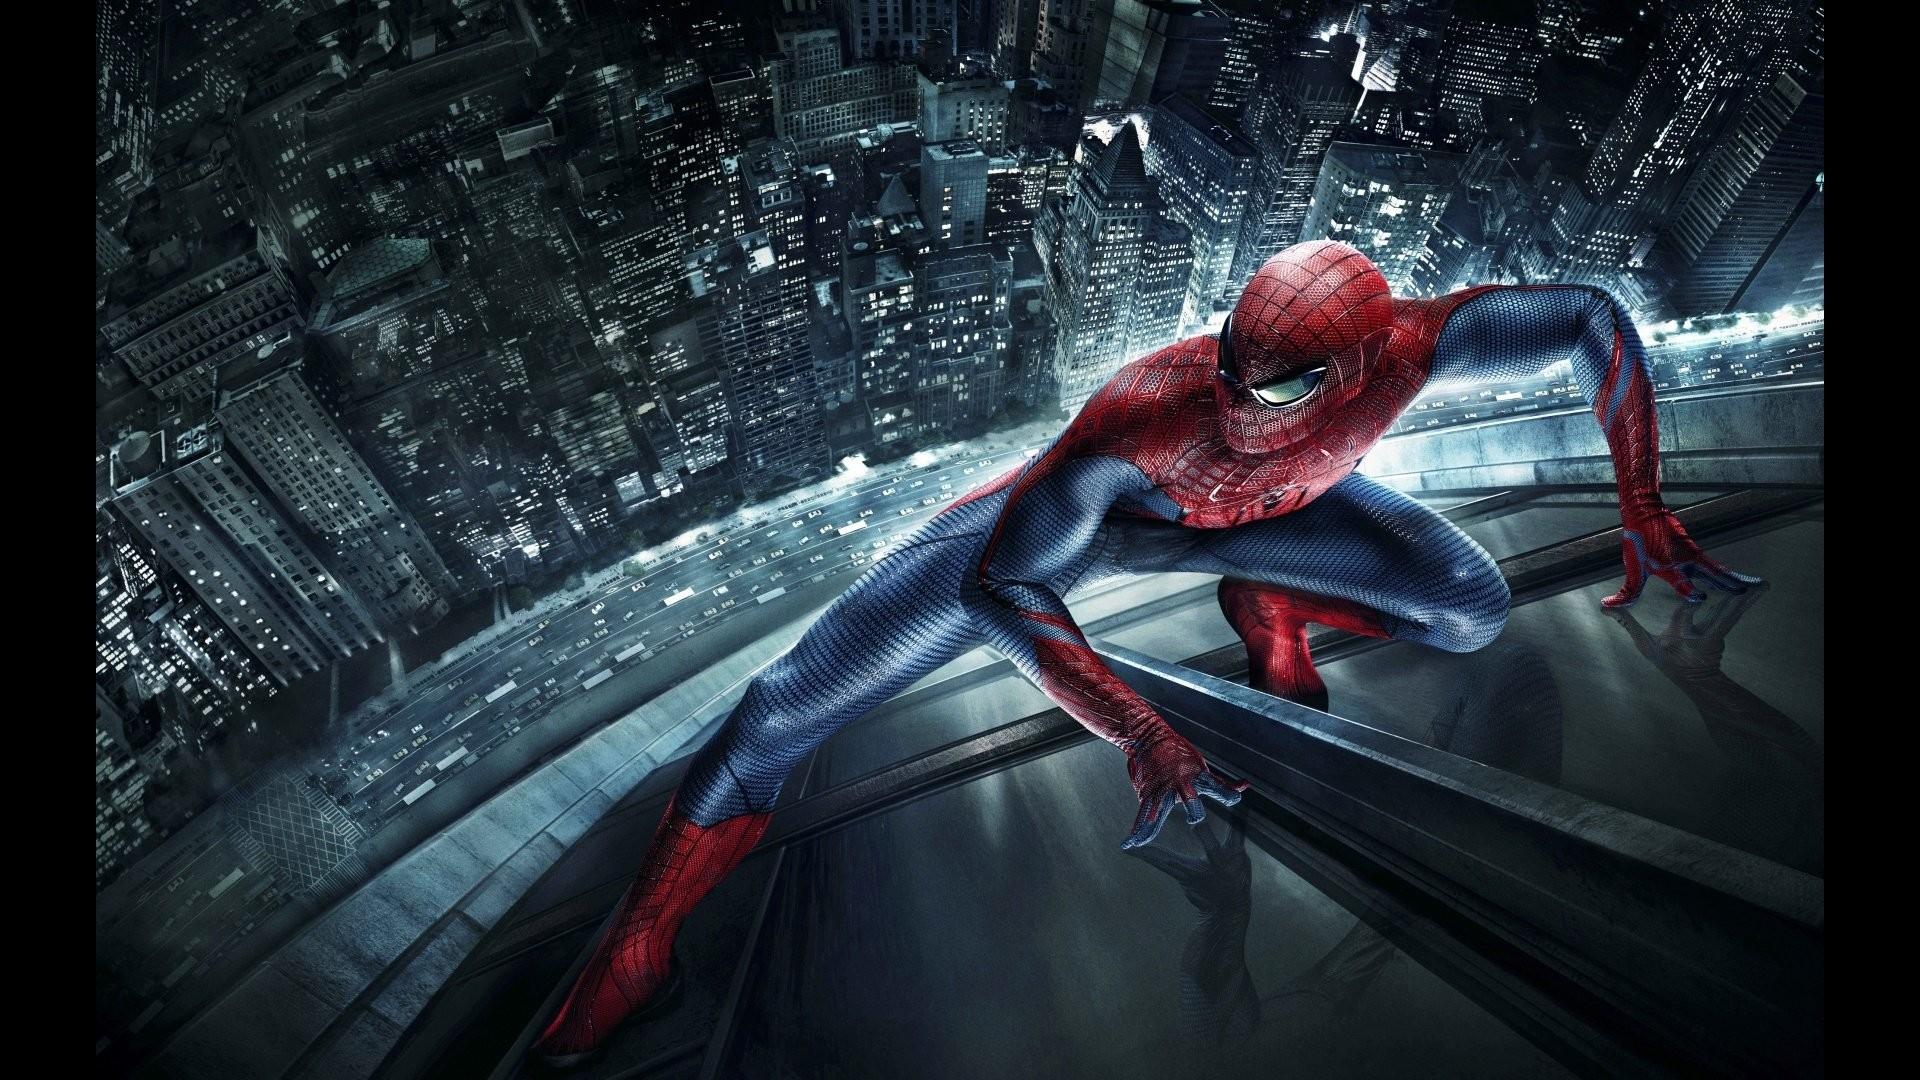 Best 25+ Spiderman hd ideas on Pinterest | Avengers hd, Andrew Garfield sin  camisa and Amazing spiderman